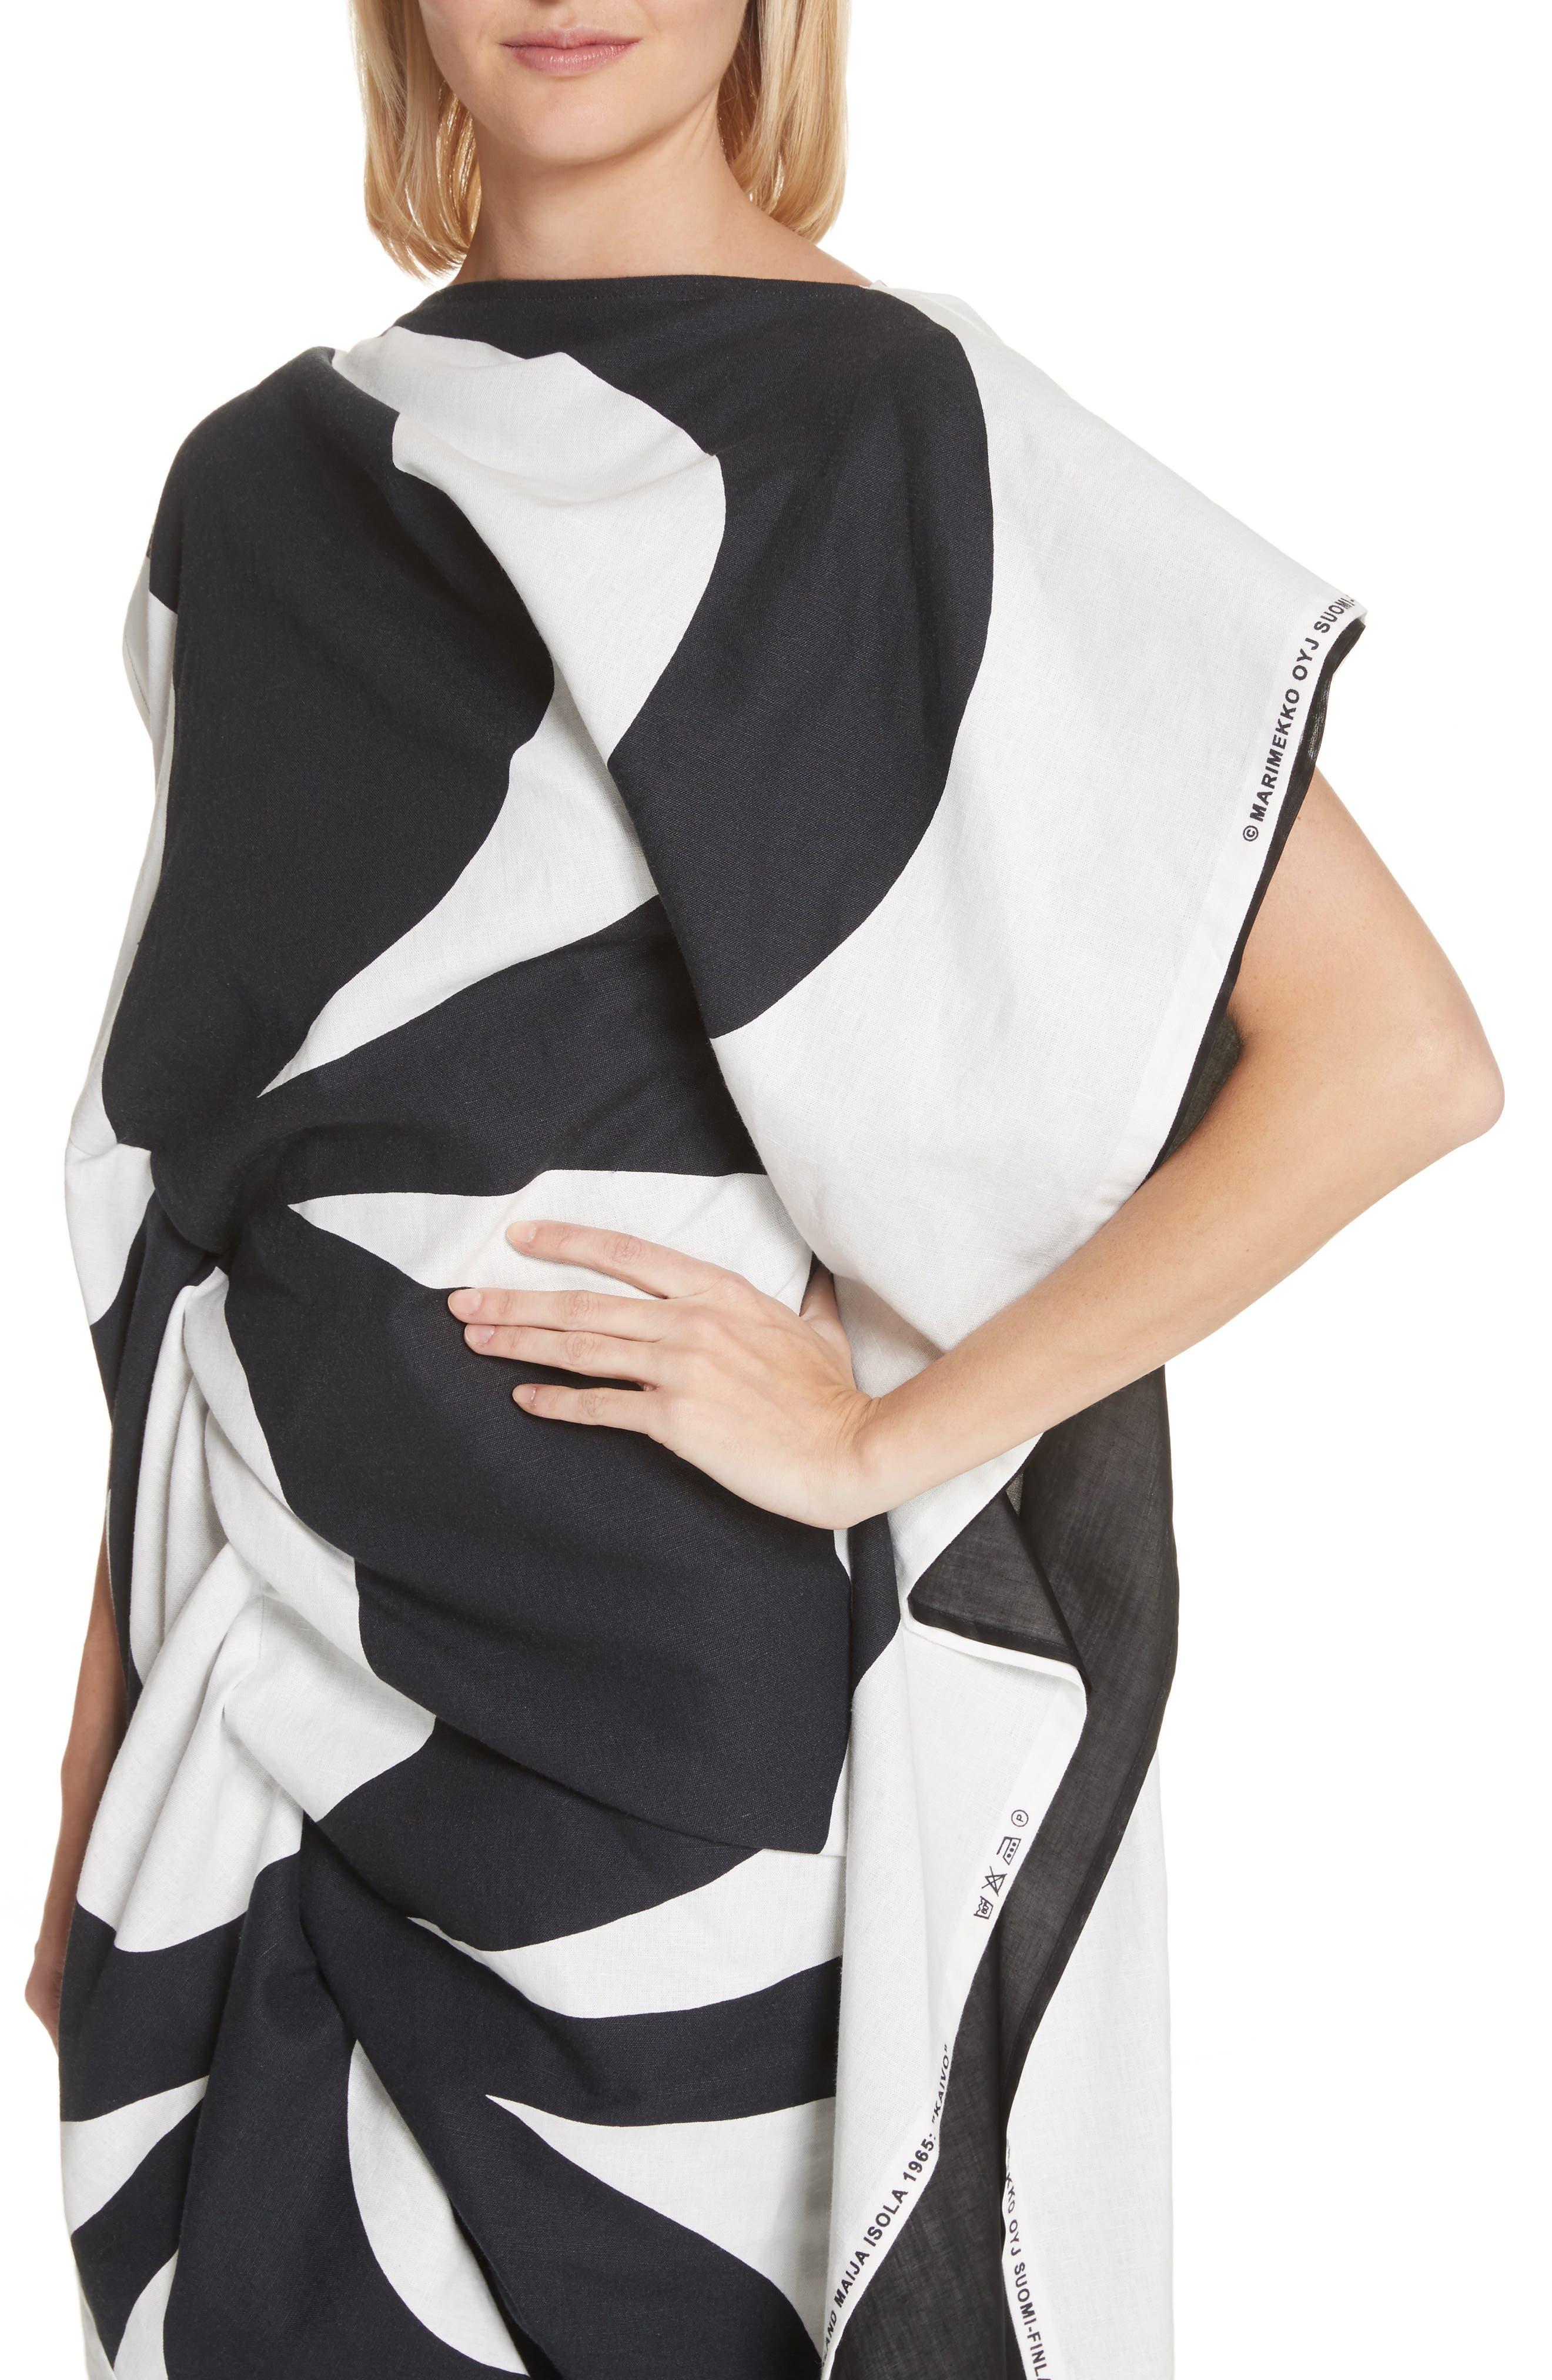 Circular Print Asymmetrical Draped Dress,                             Alternate thumbnail 4, color,                             Wht/ Blk X Blk